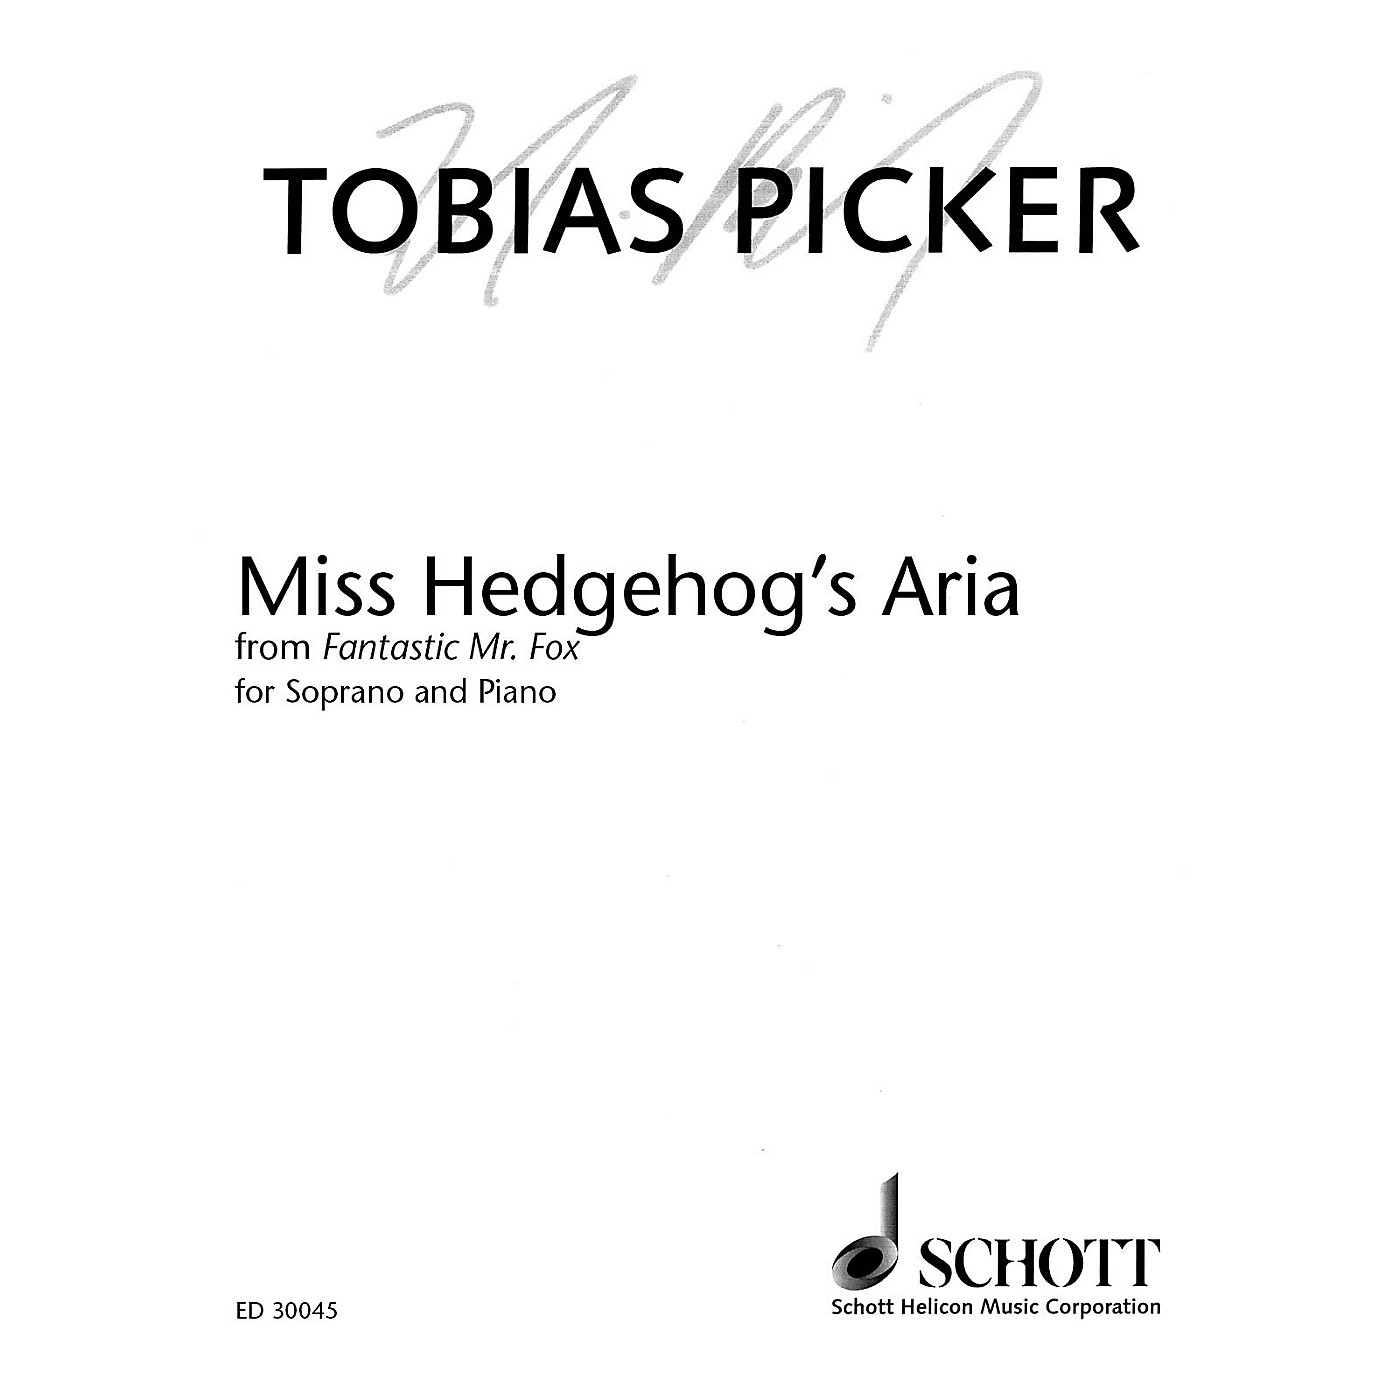 Schott Miss Hedgehog's Aria from Fantastic Mr. Fox (Soprano and Piano) Opera Series  by Tobias Picker thumbnail